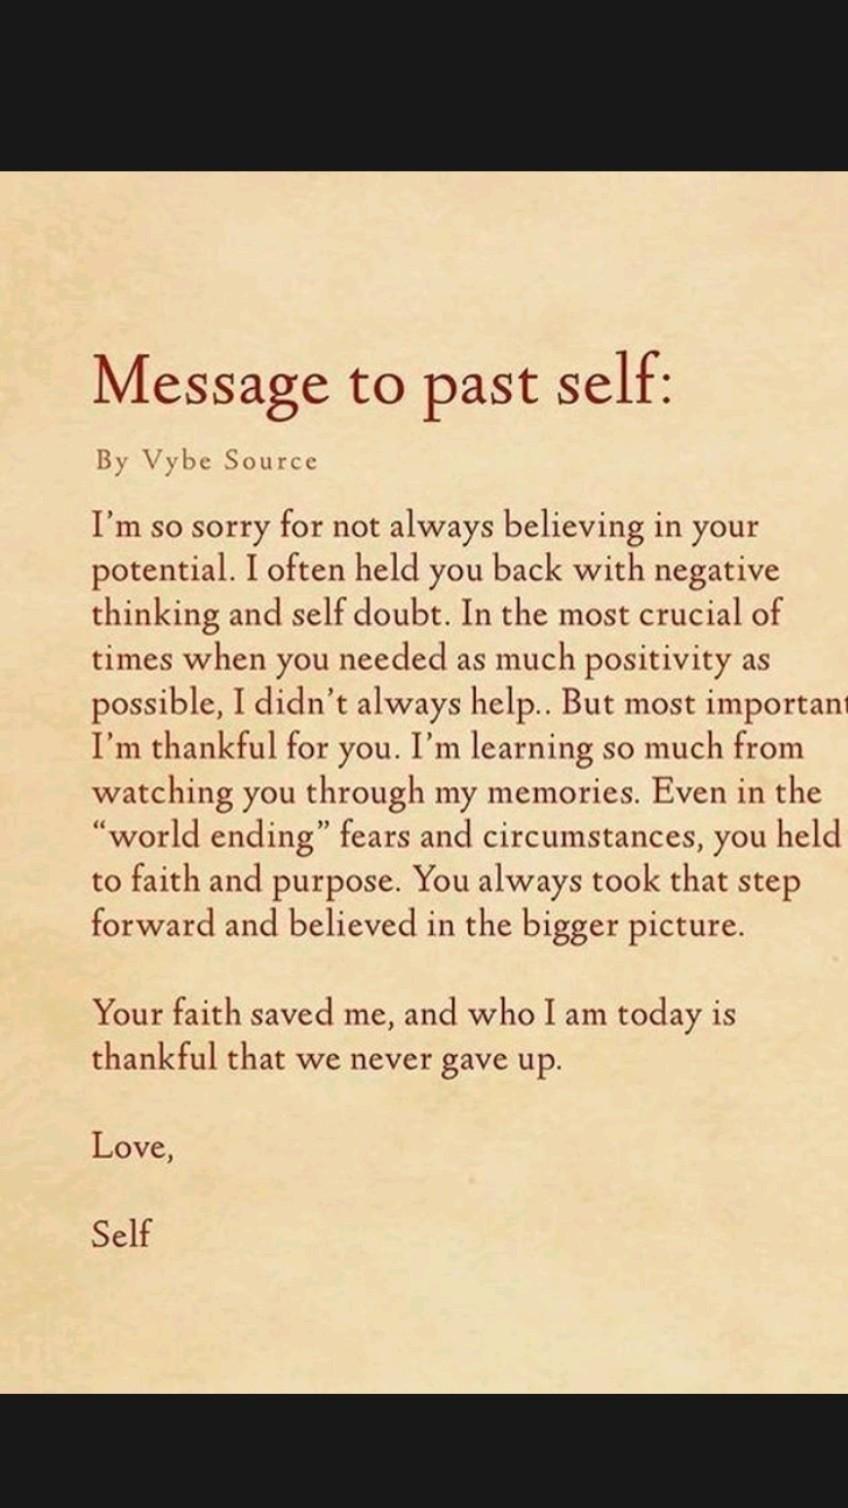 Gratitude Peace & Make time for you.❤ #selfdevelopment  #lifecoaching  #personalmastery  #mindfulnes